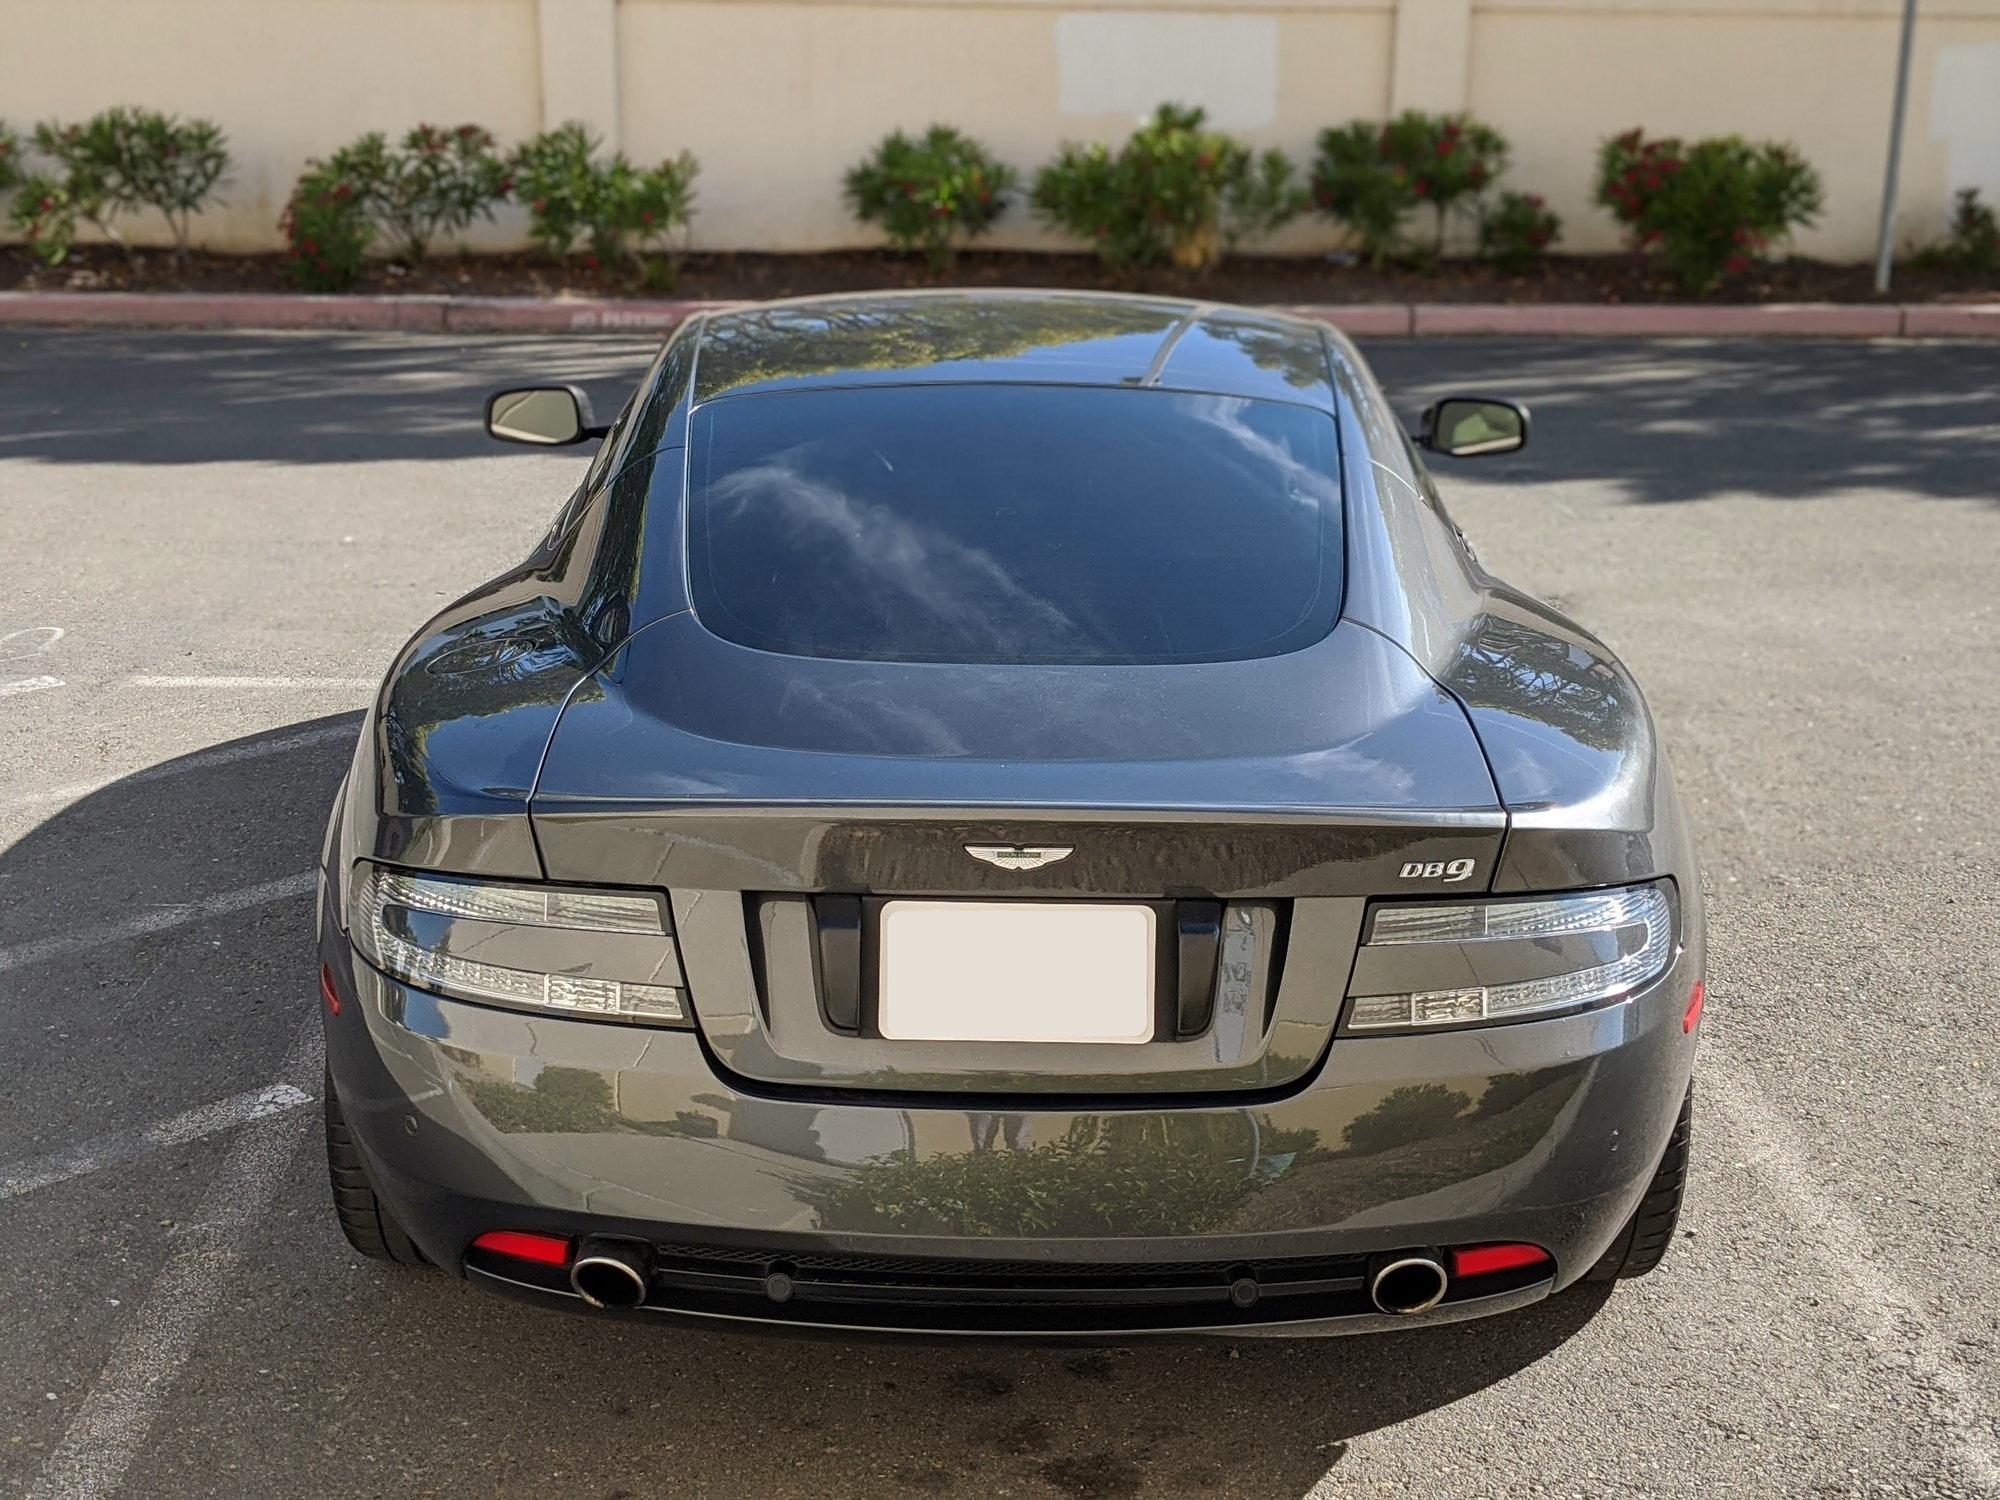 Db9 Clear Carbon Trim Tail Light Installation Tips 6speedonline Porsche Forum And Luxury Car Resource